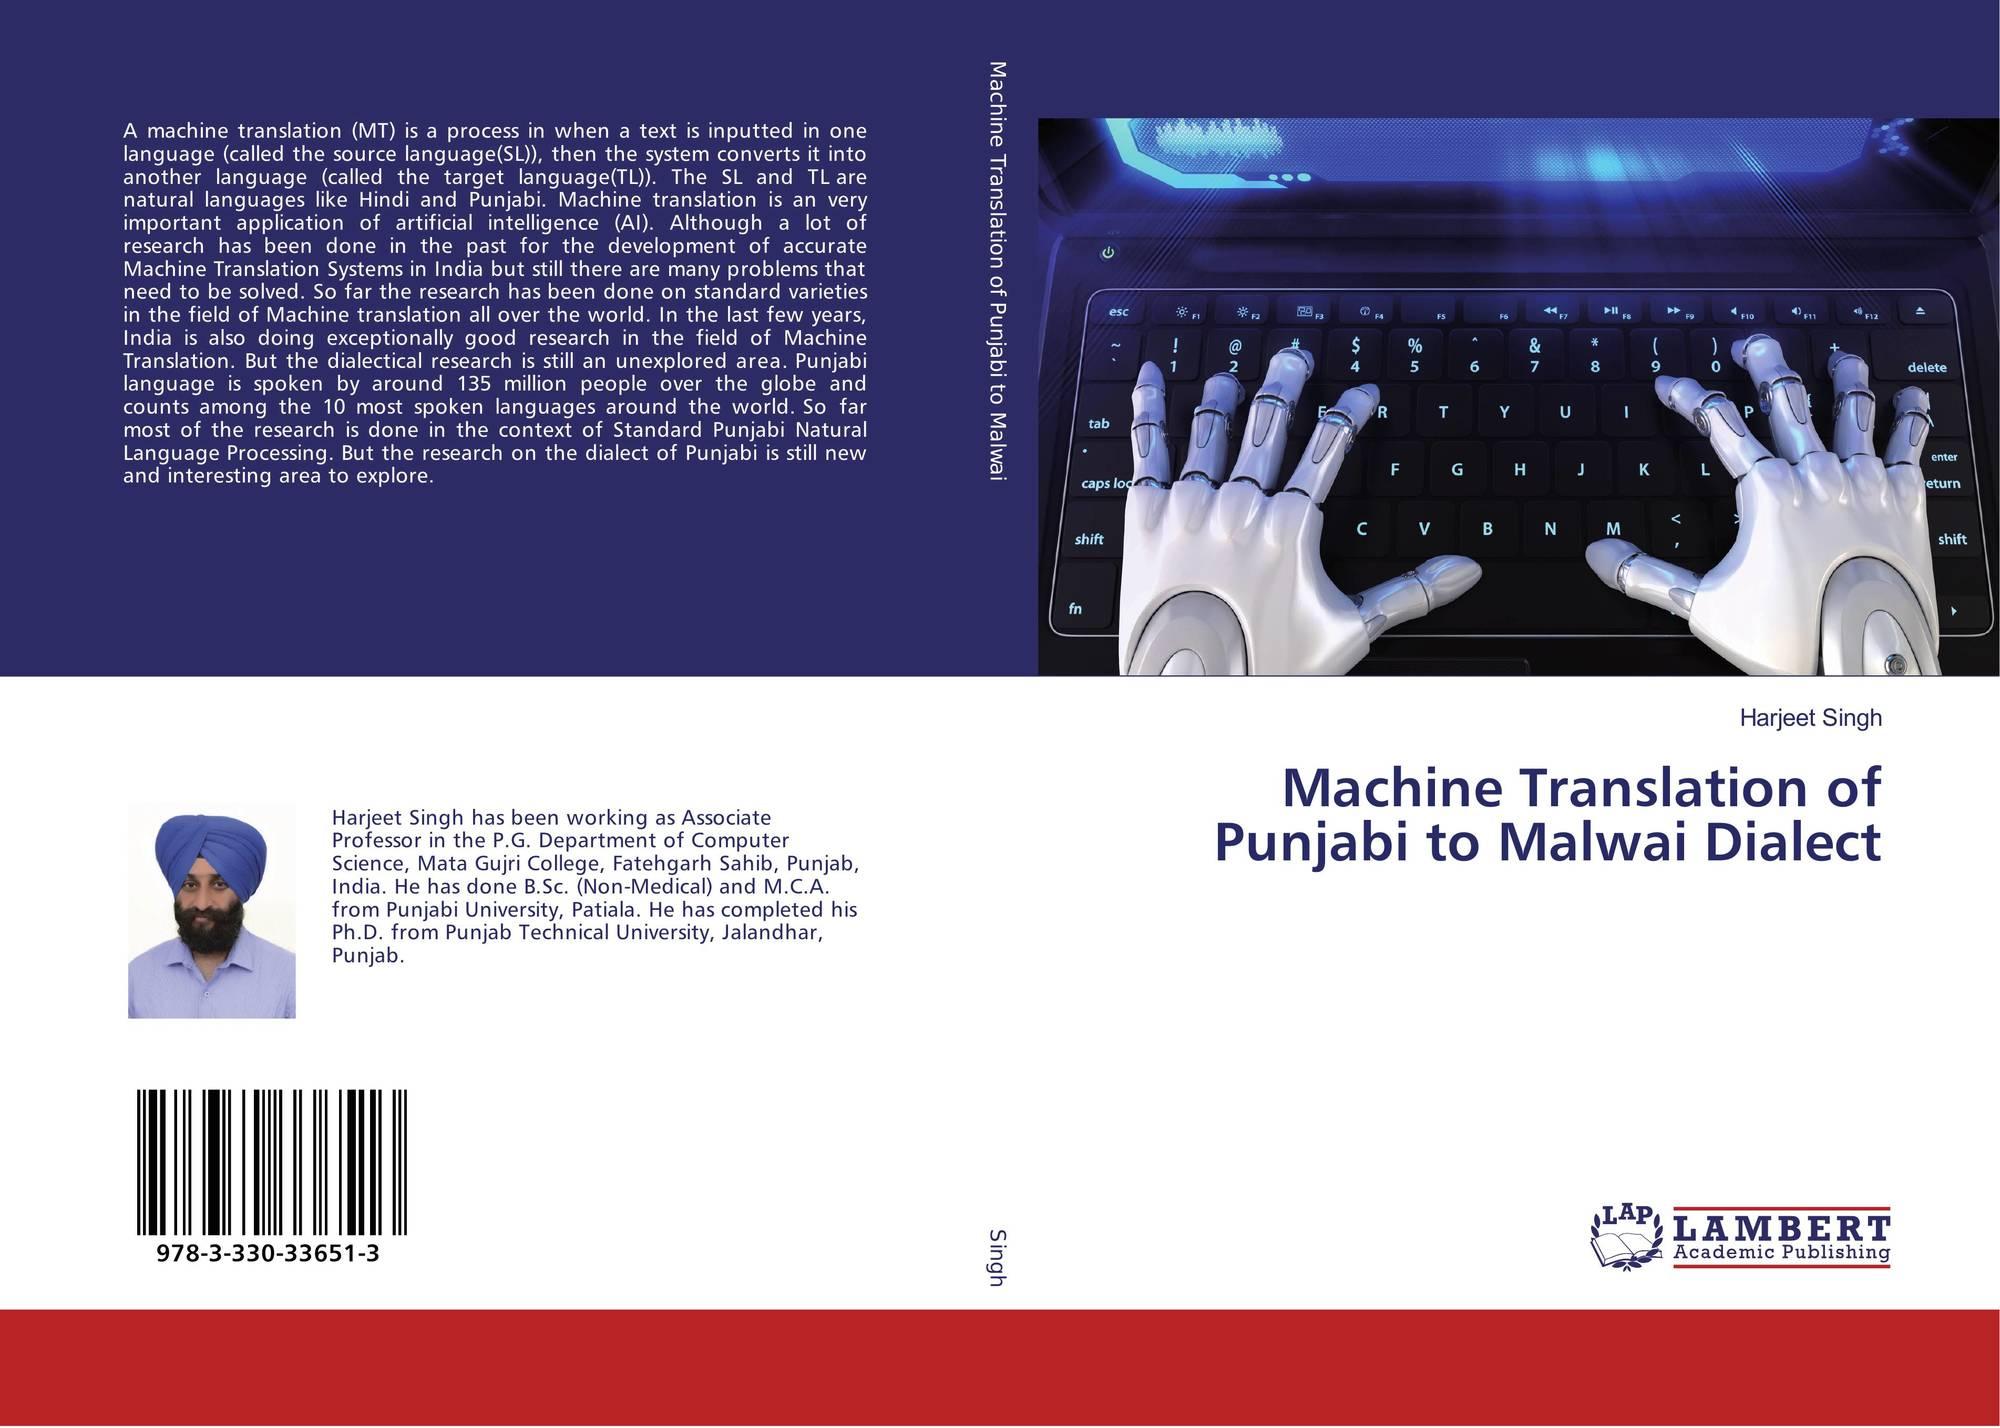 Machine Translation of Punjabi to Malwai Dialect, 978-3-330-33651-3